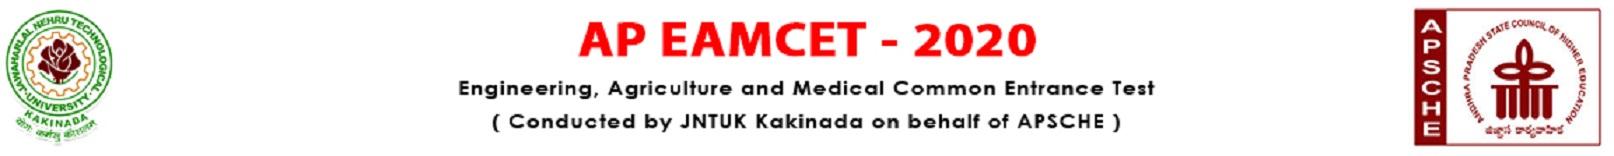 Check AP EAMCET Merit List Rank List  Score Card  Rank Card @Apsche.org - Andhra Pradesh EAMCET Result 2020 1